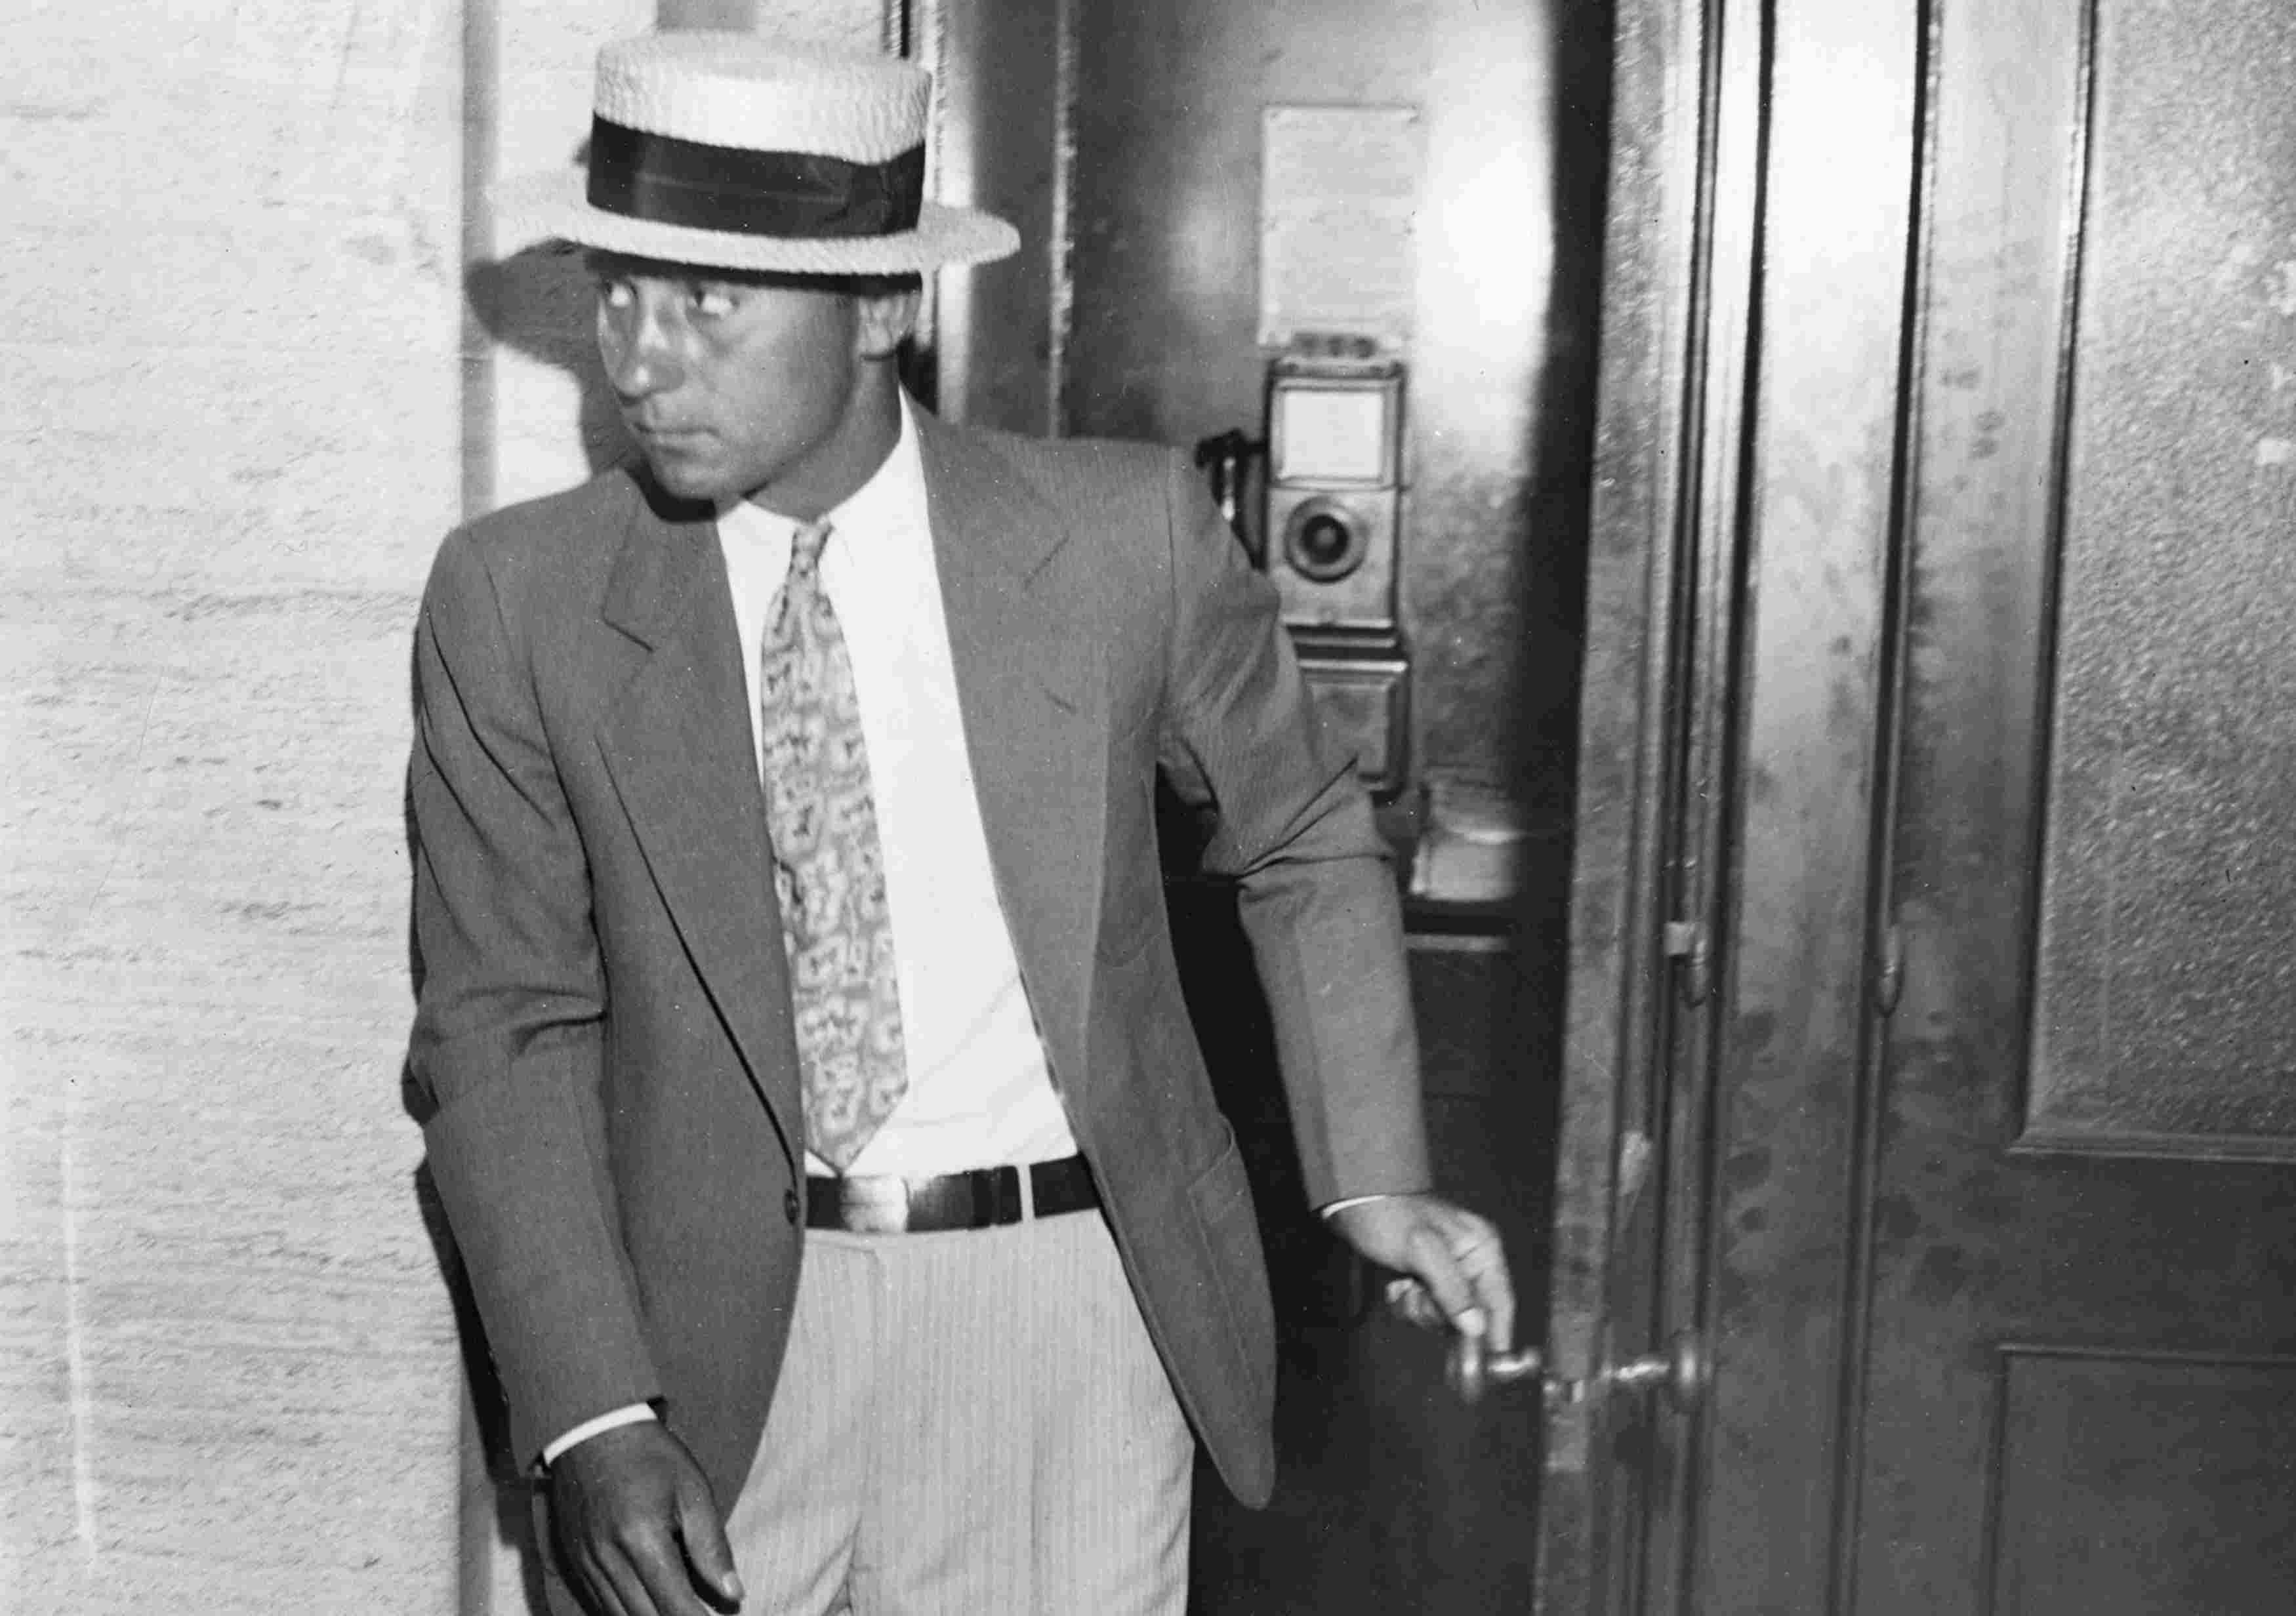 Al Capone enforcer 'Machine Gun' Jack McGurn